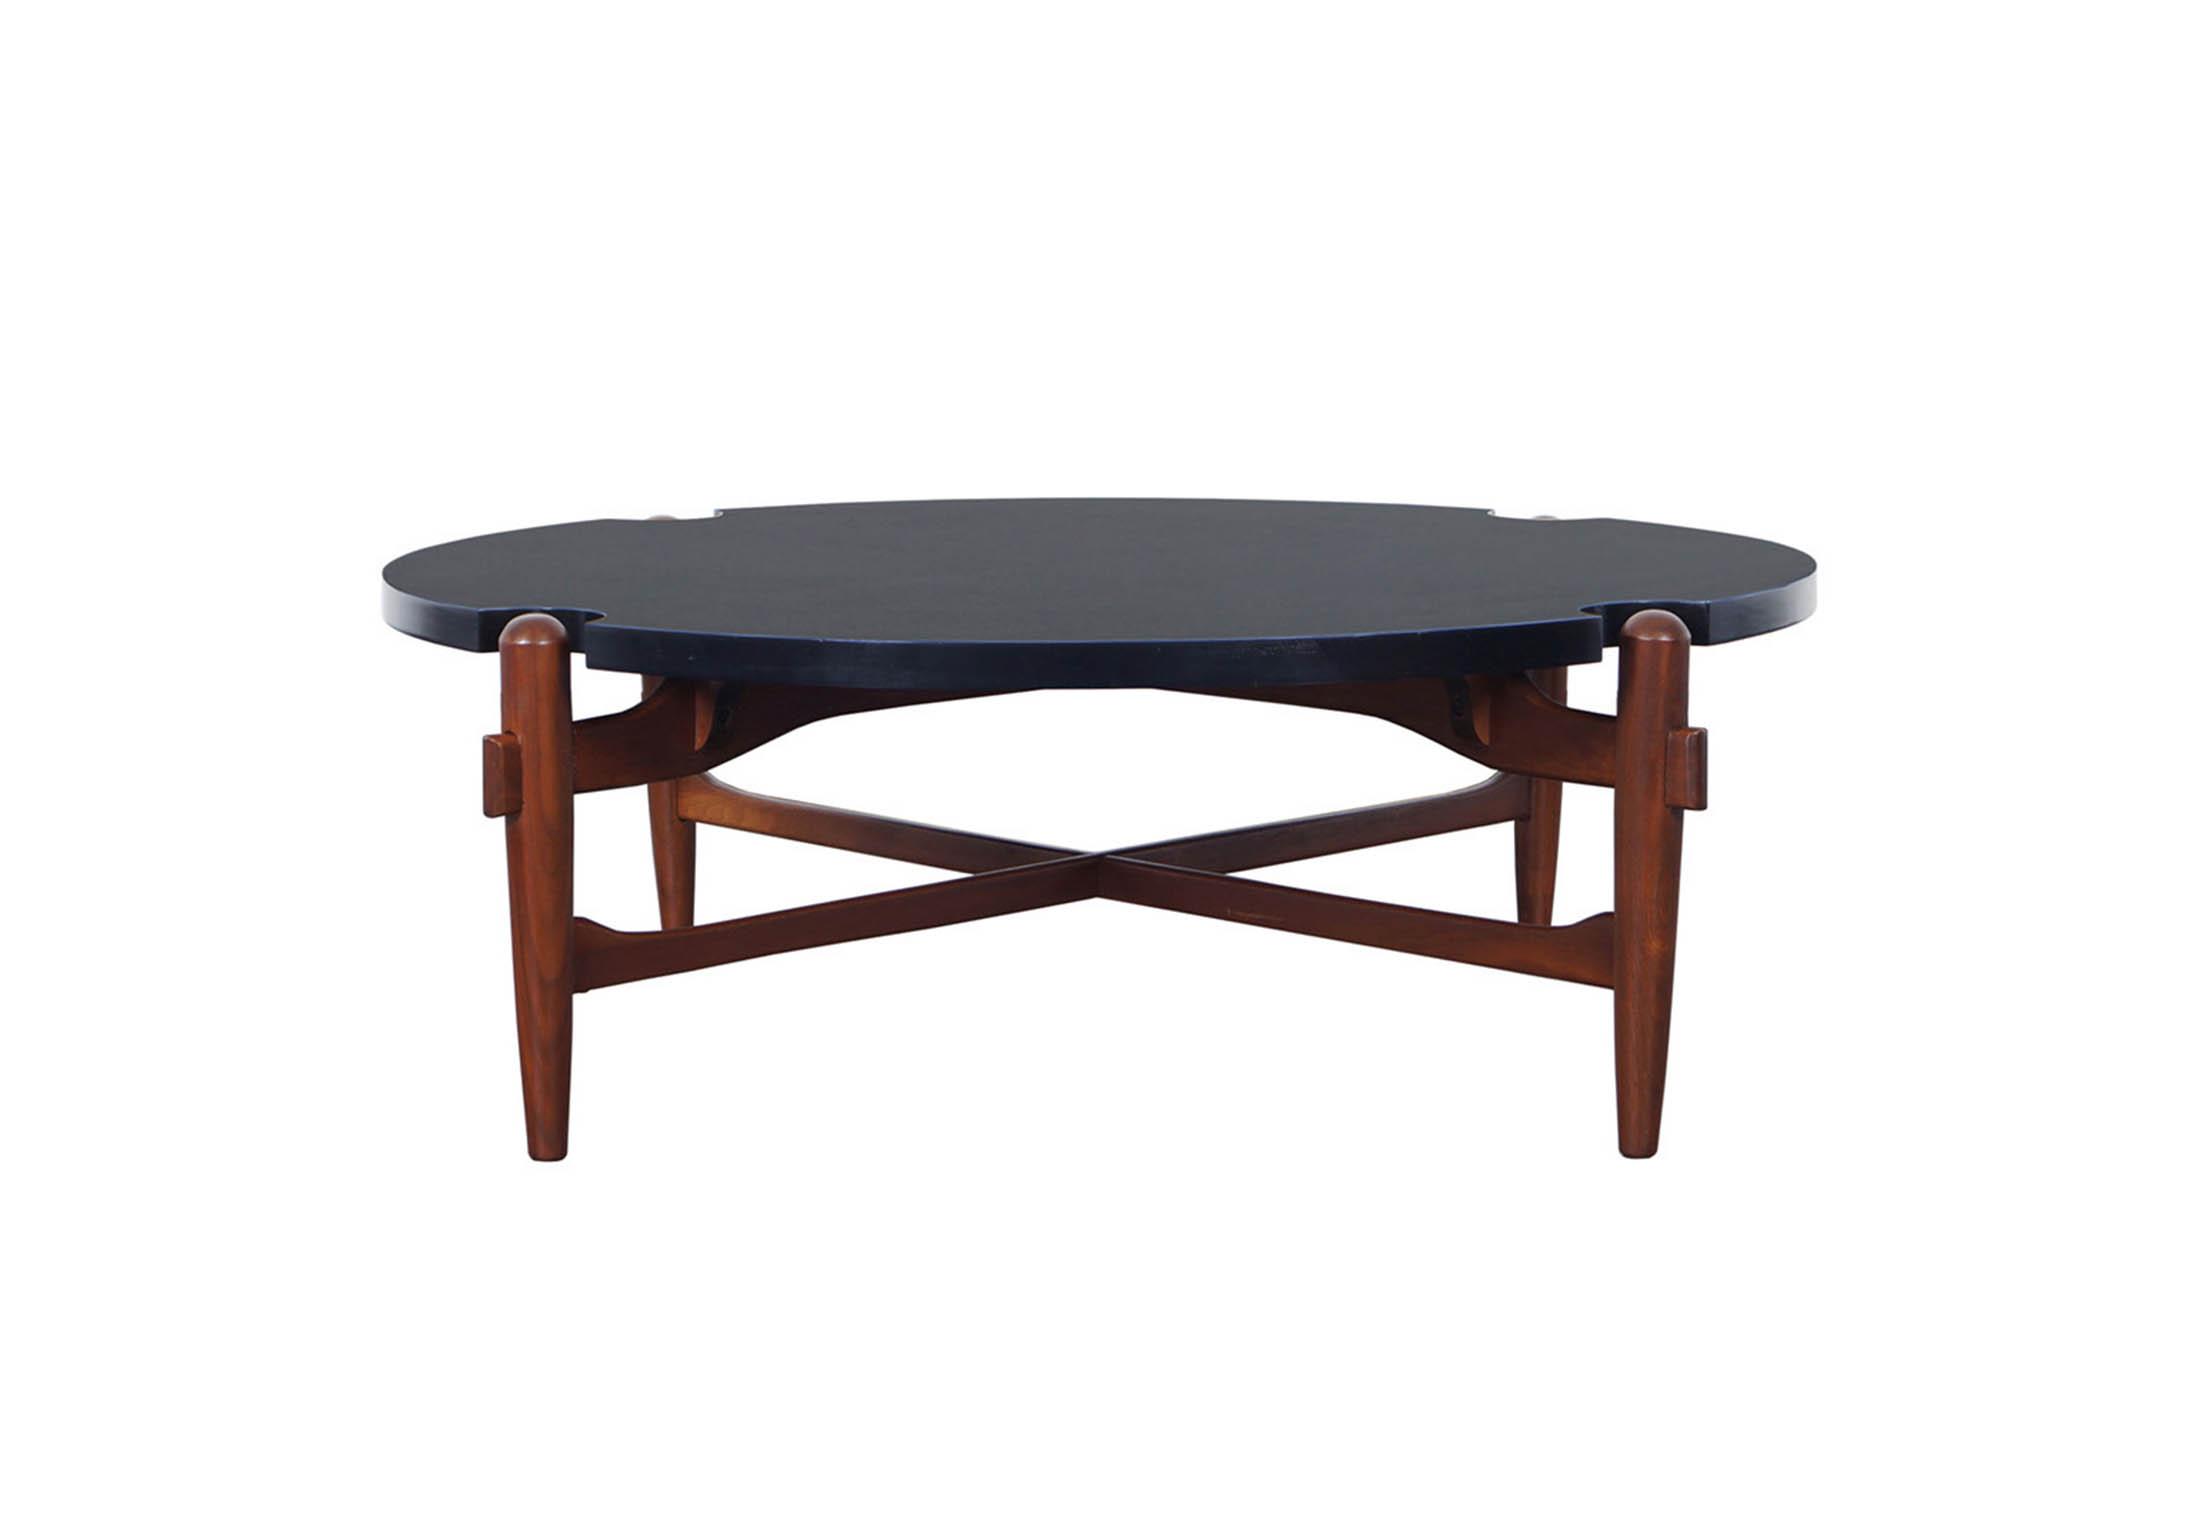 Vintage Coffee Table Attributed to Greta Grossman